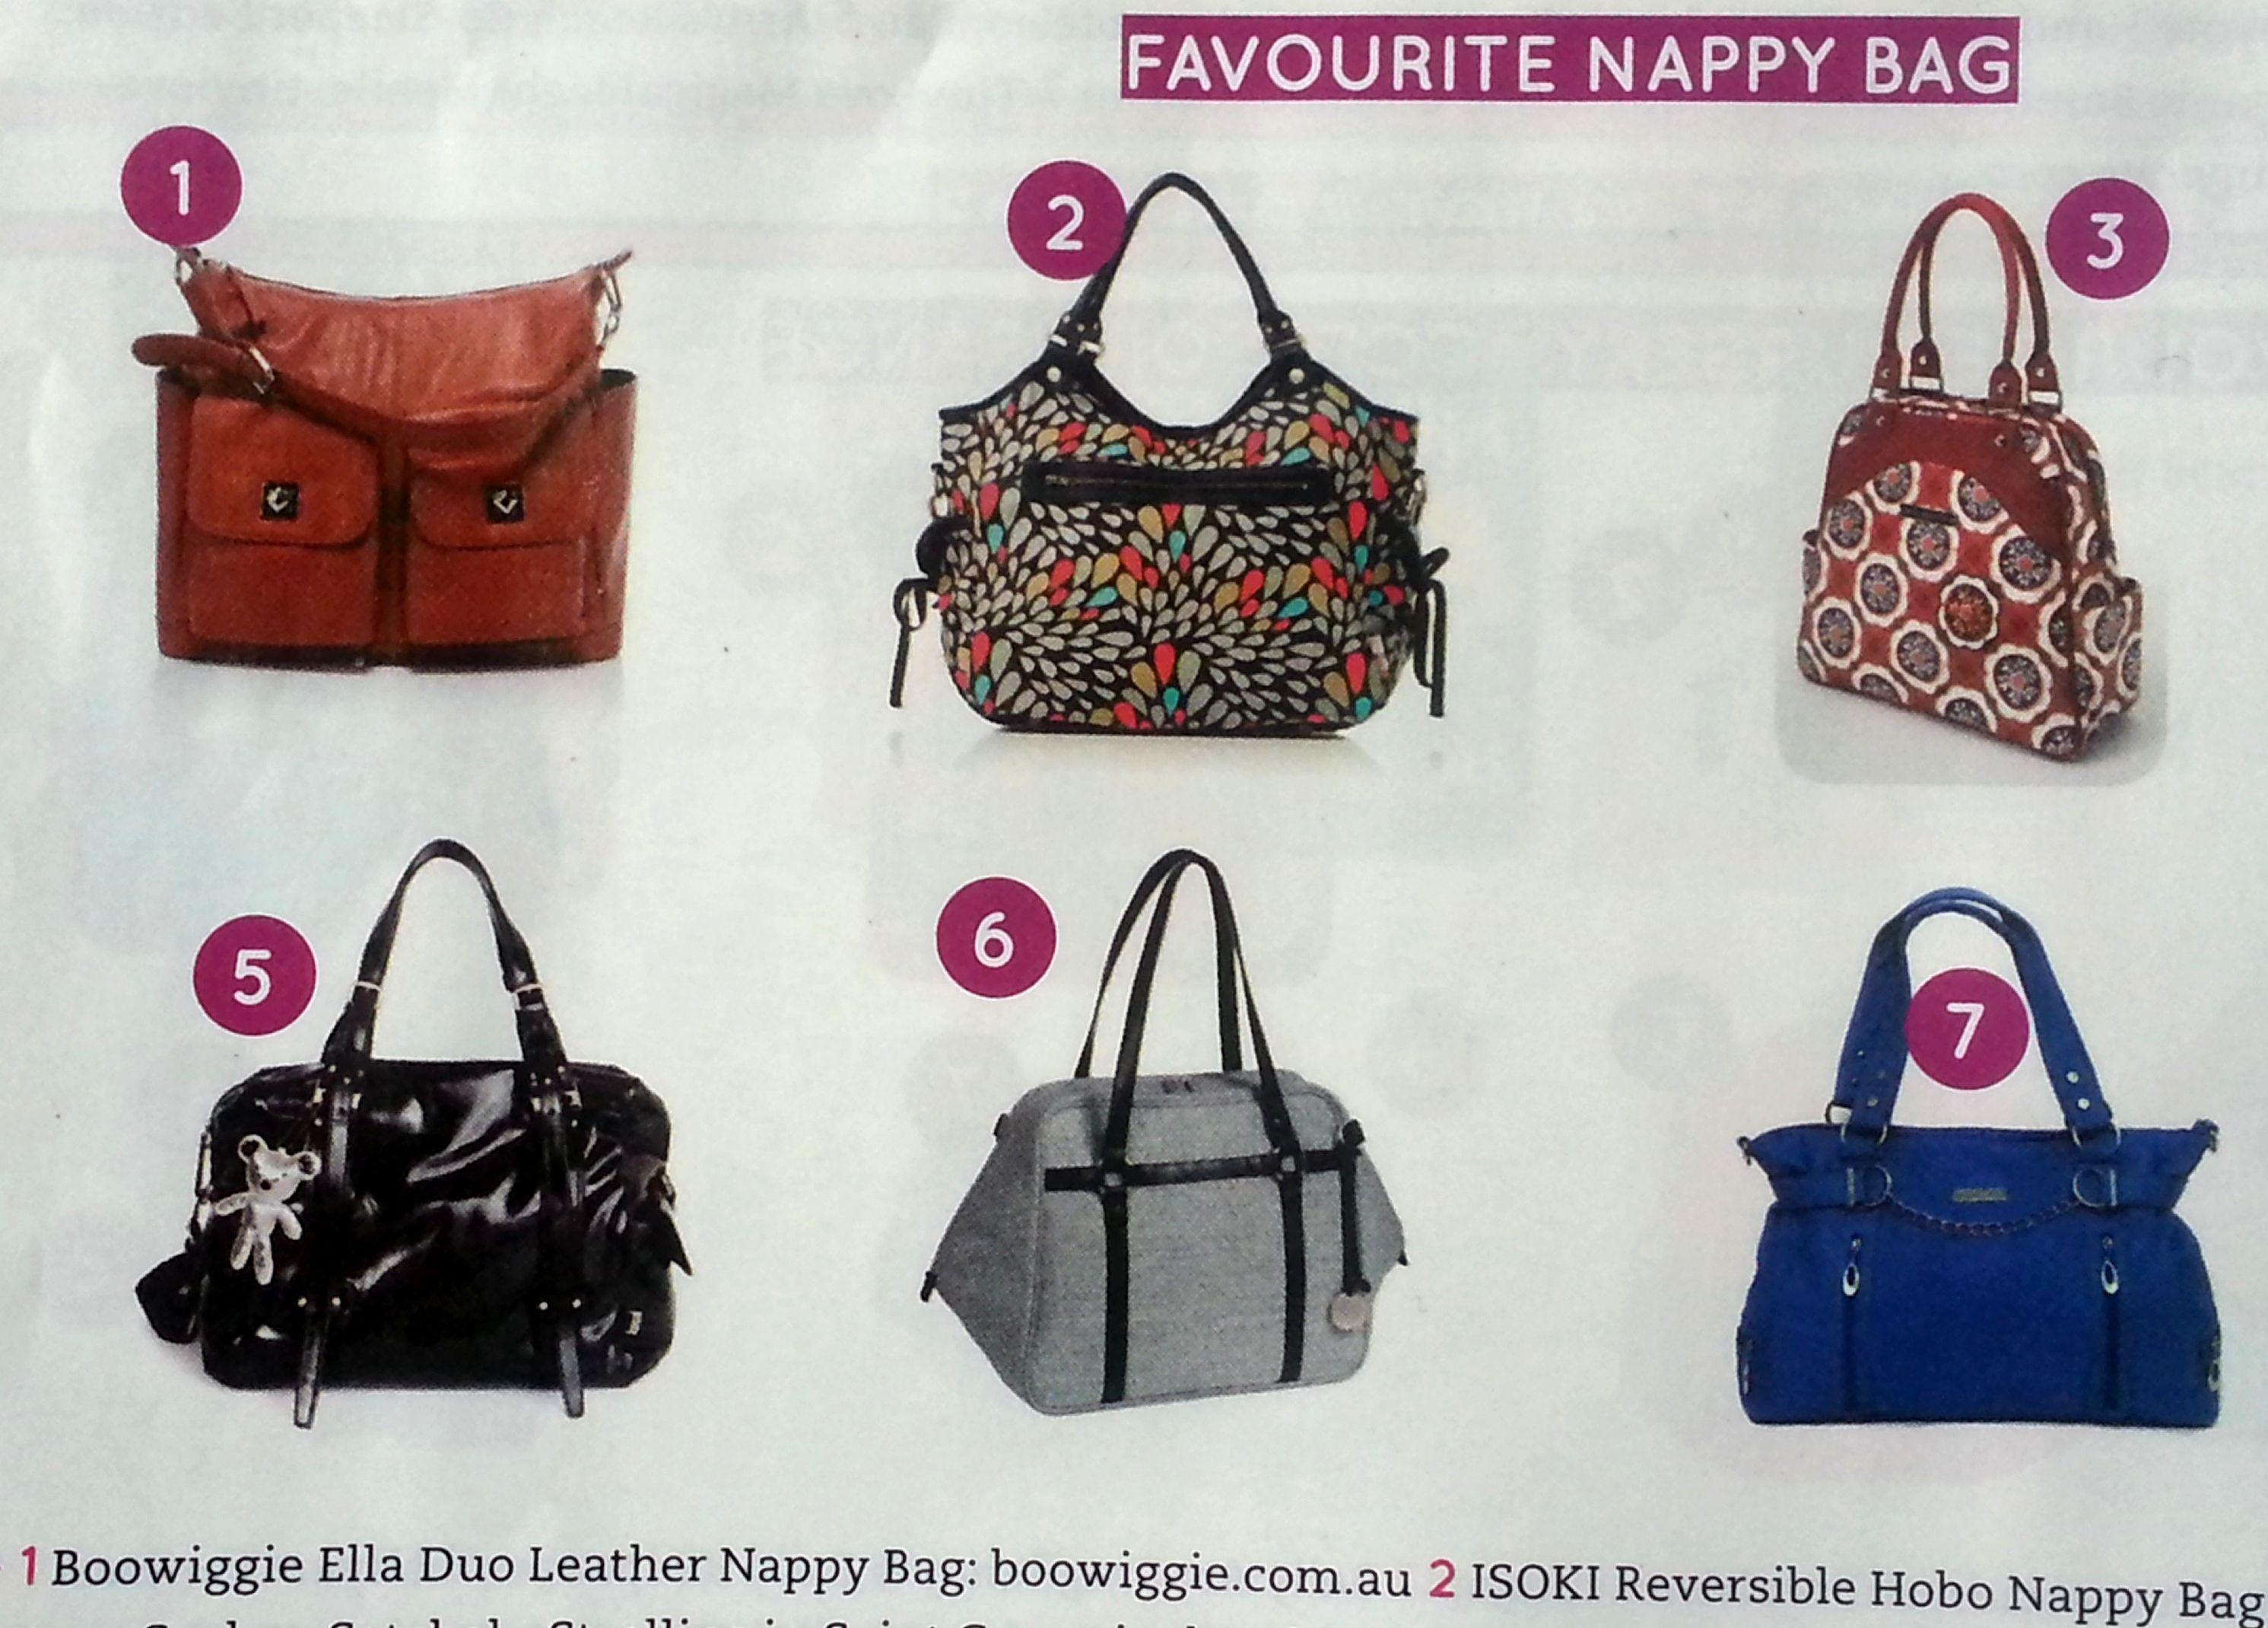 "Ella Duo nappy diaper bag in tan featured My Child Magazine ""Favourite Nappy Bag"". #press #nappybag #diaperbag"